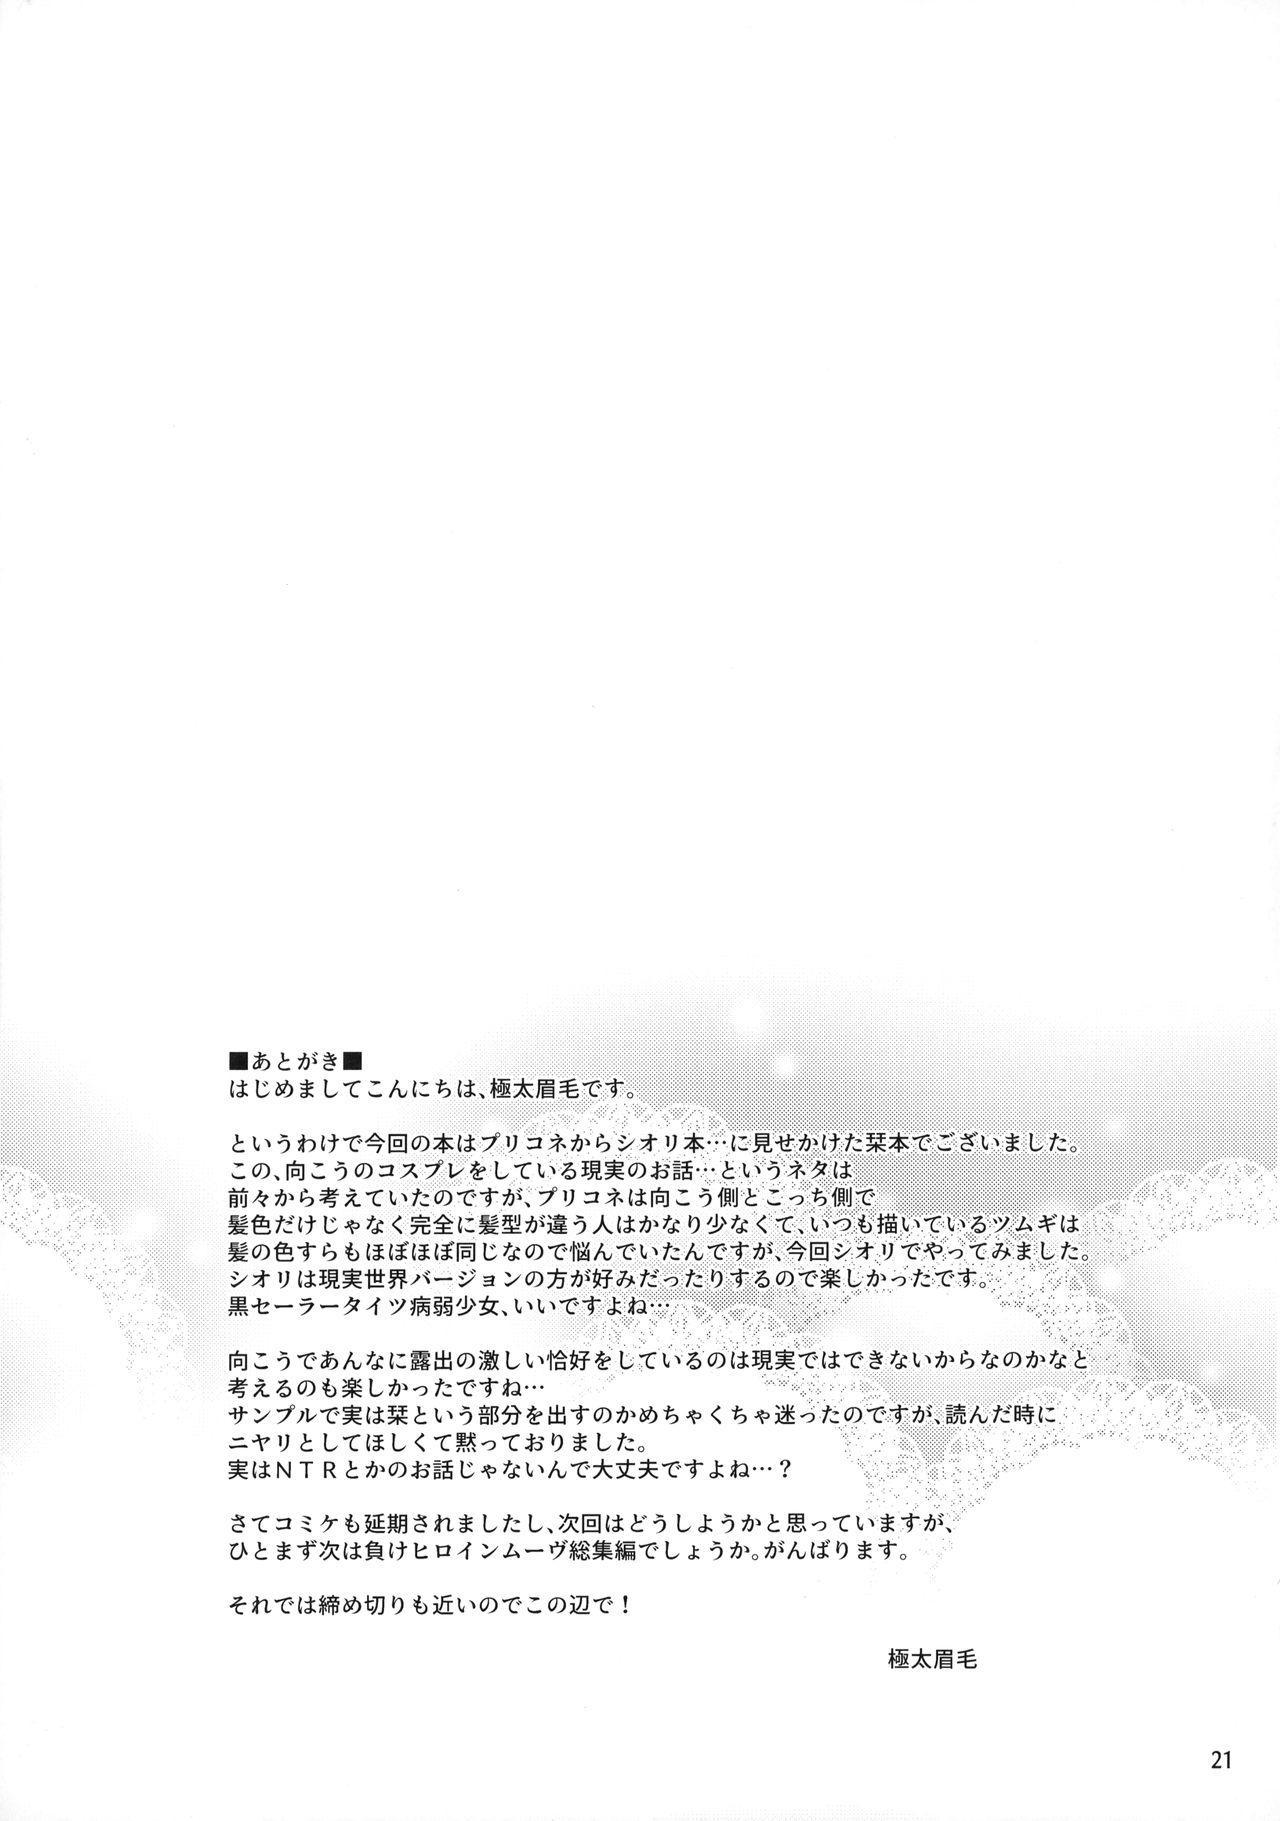 Shiori no Ecchi na Hi 19